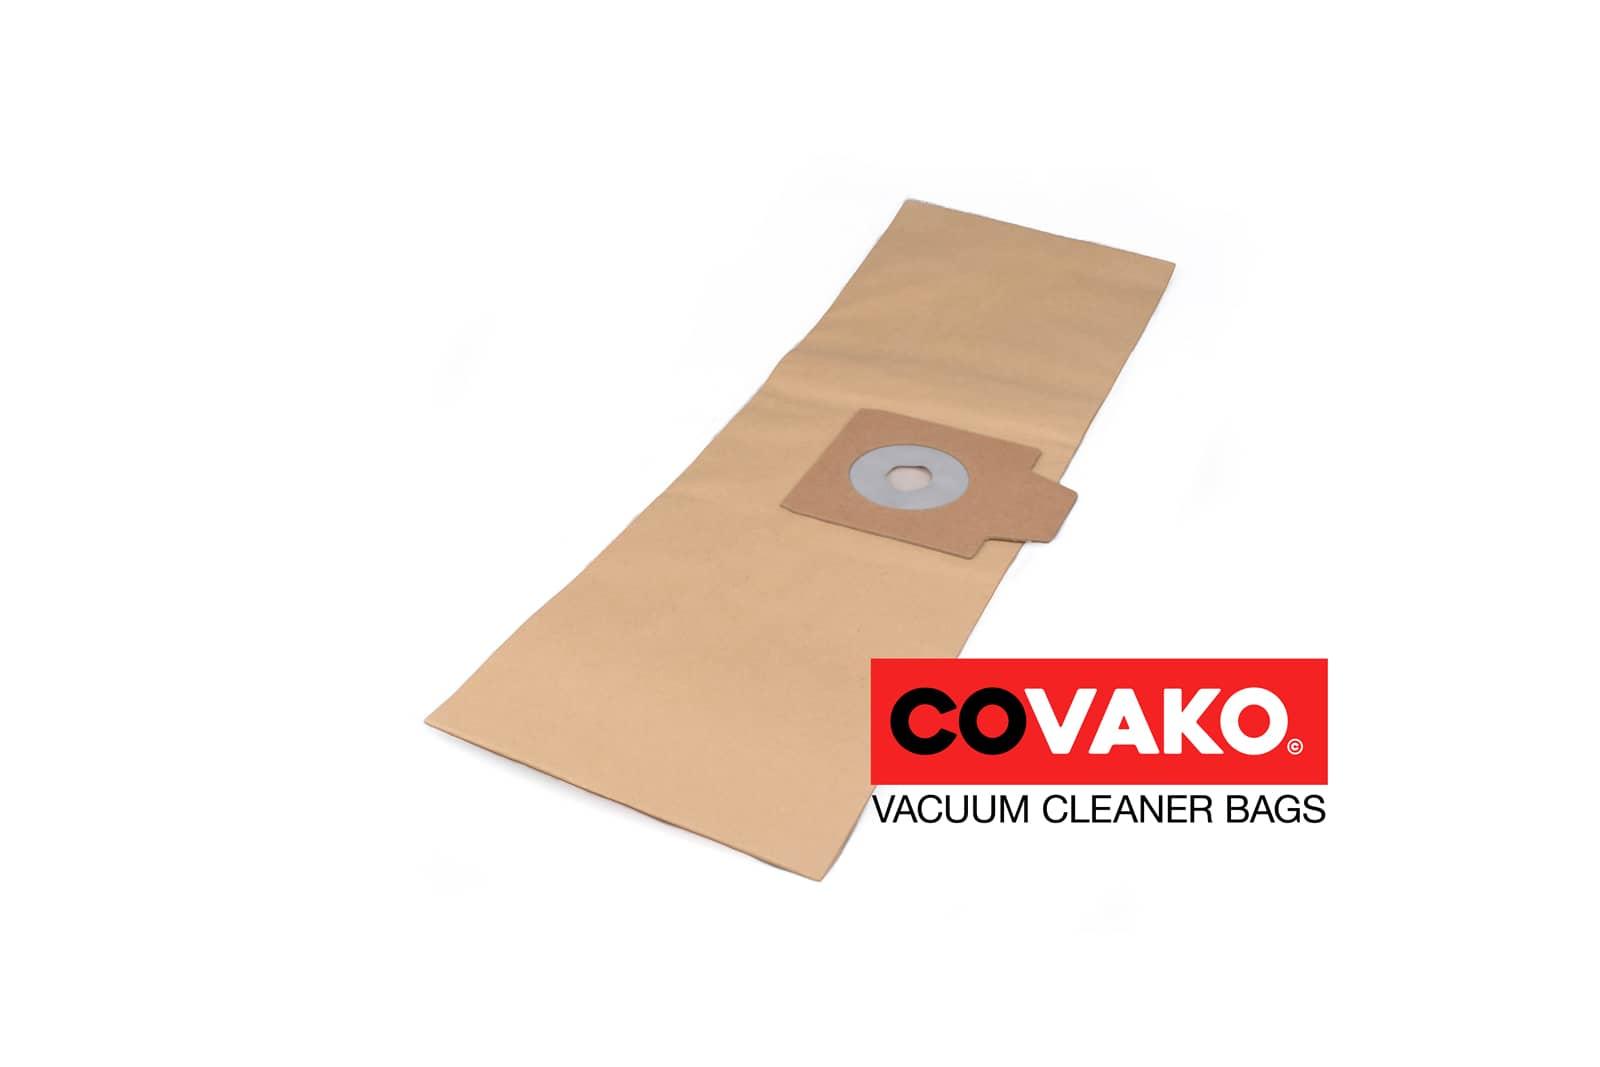 Electrolux UZ 872 / Paper - Electrolux vacuum cleaner bags